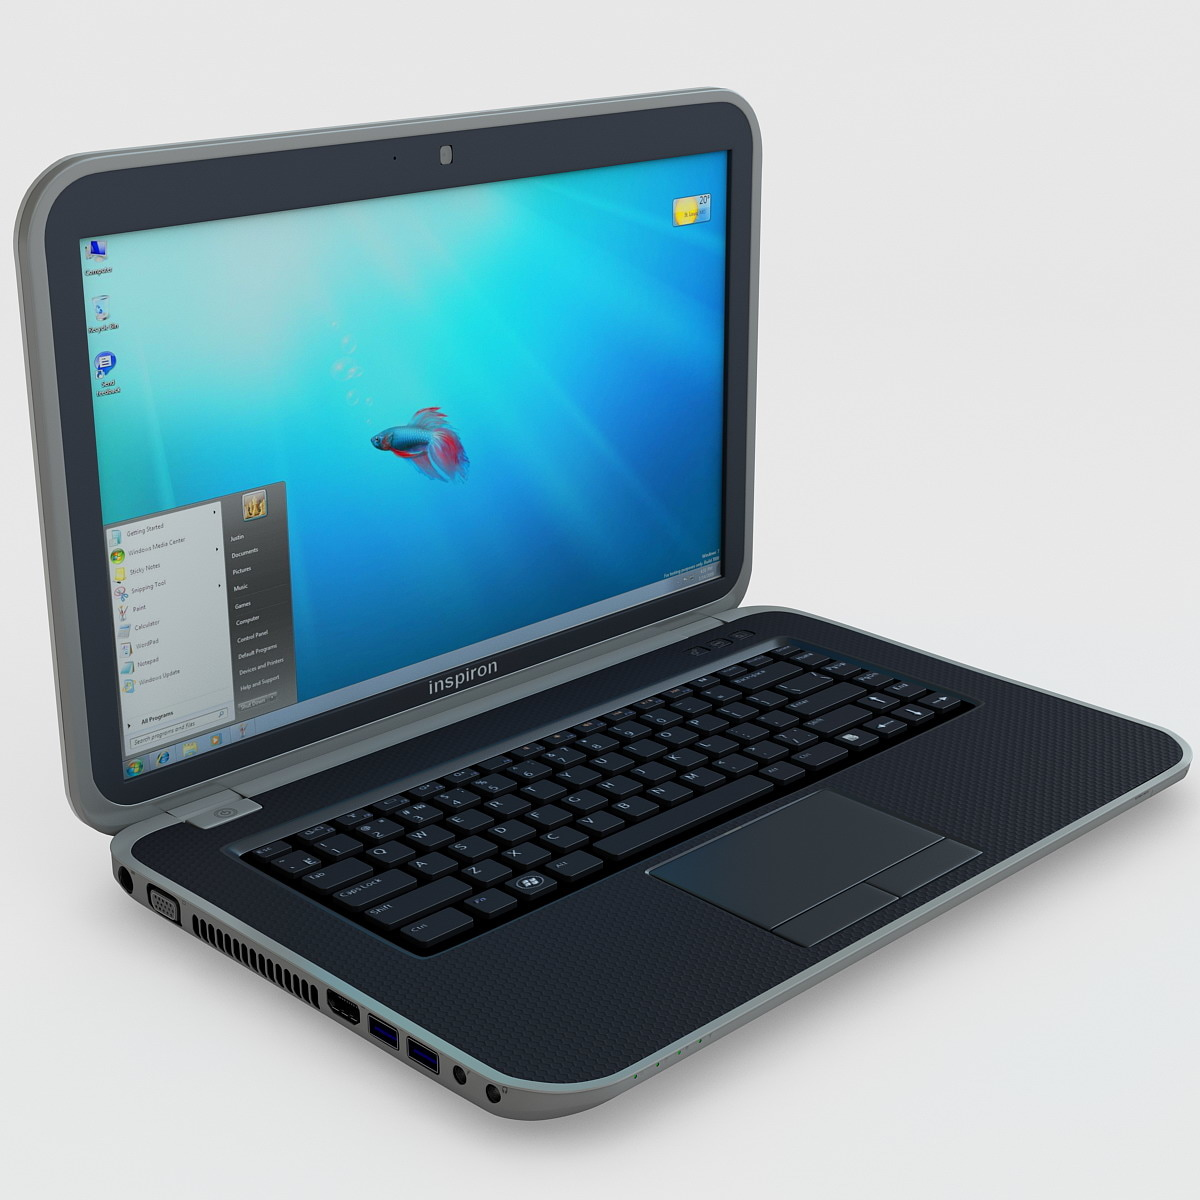 Laptop_Dell_Inspiron_7520_004.jpg